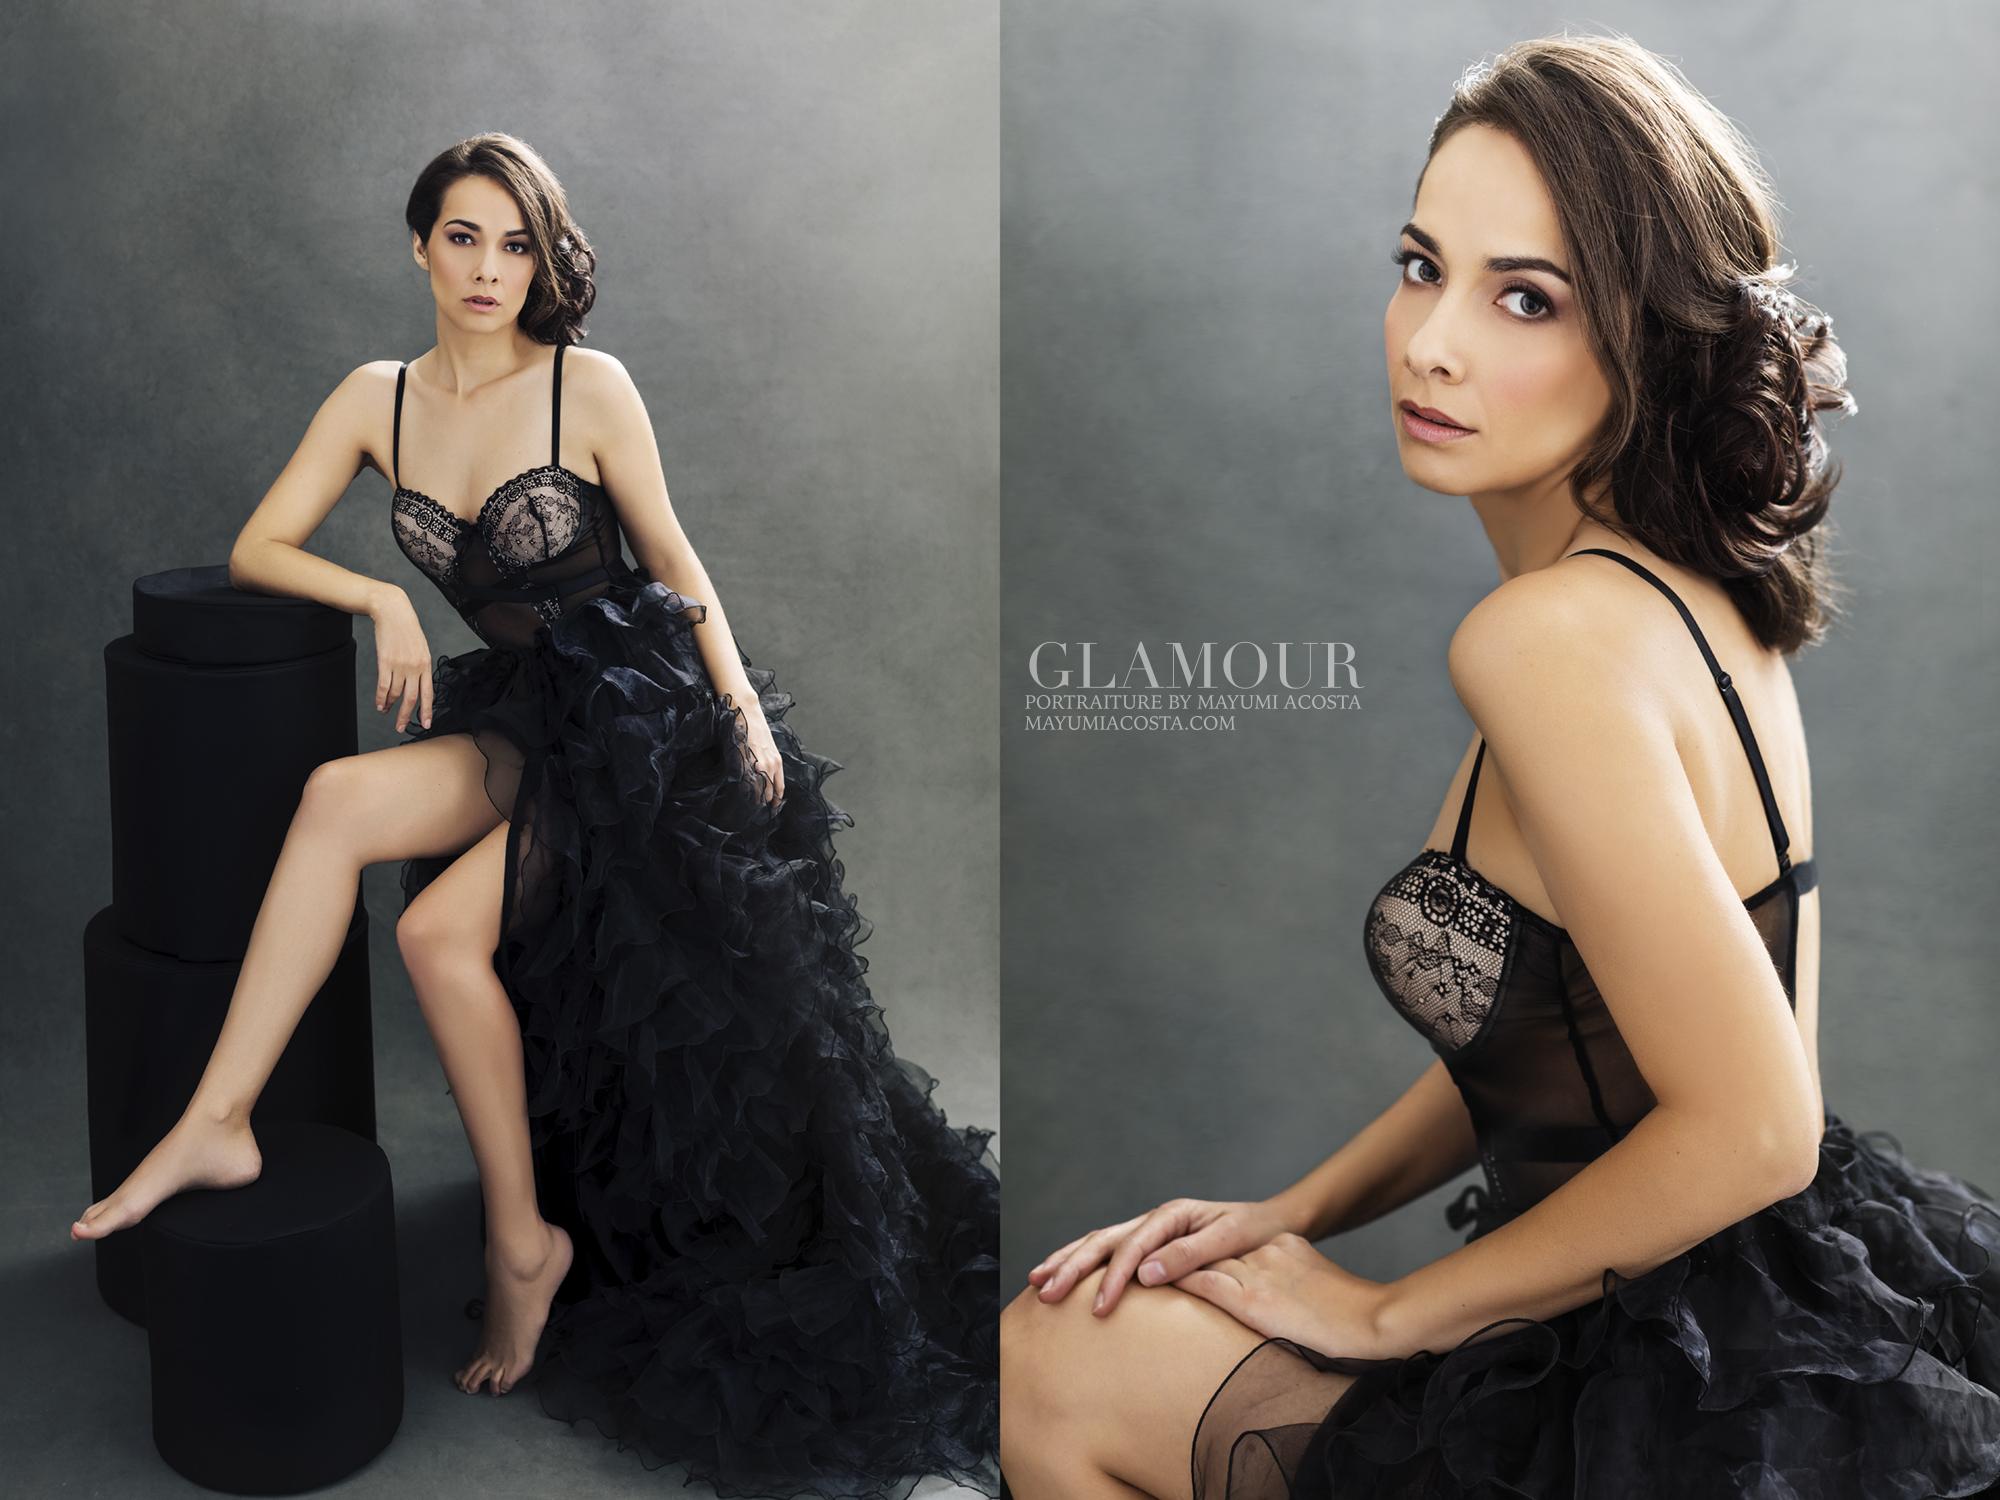 Stunning glamour photography by Mayumi Acosta